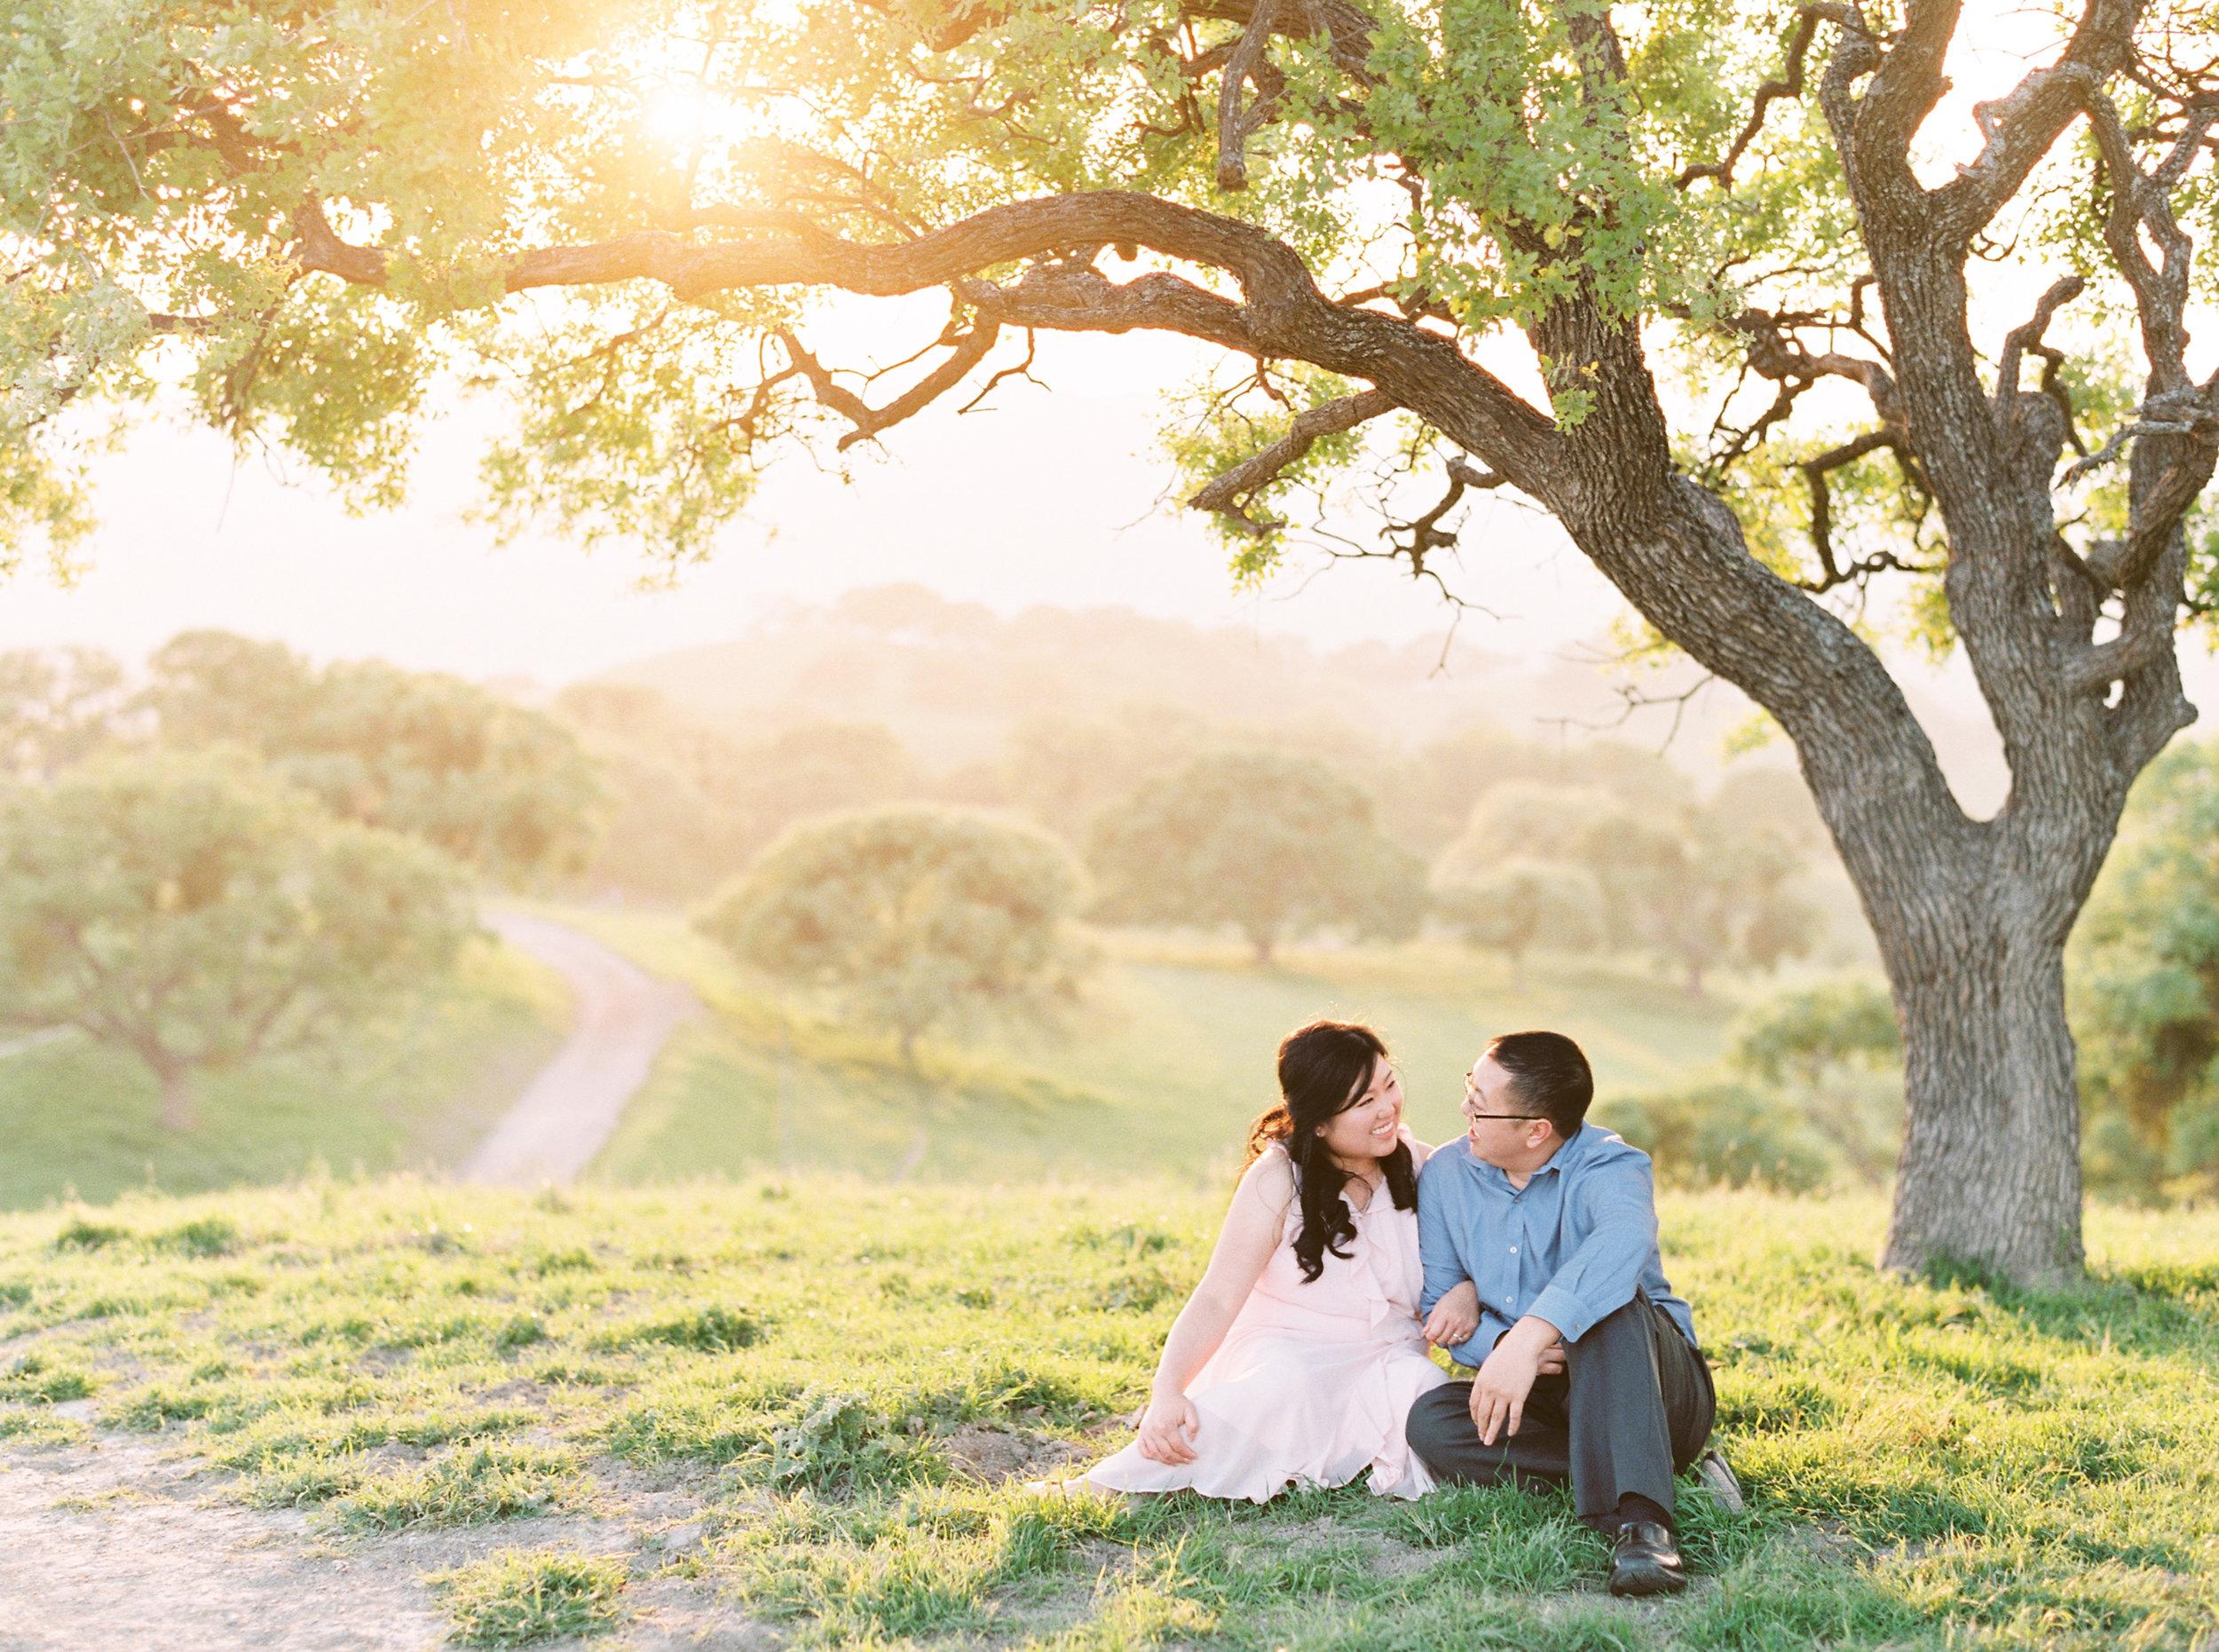 del-valle-livermore-bay-area-wedding-photographer-42.jpg